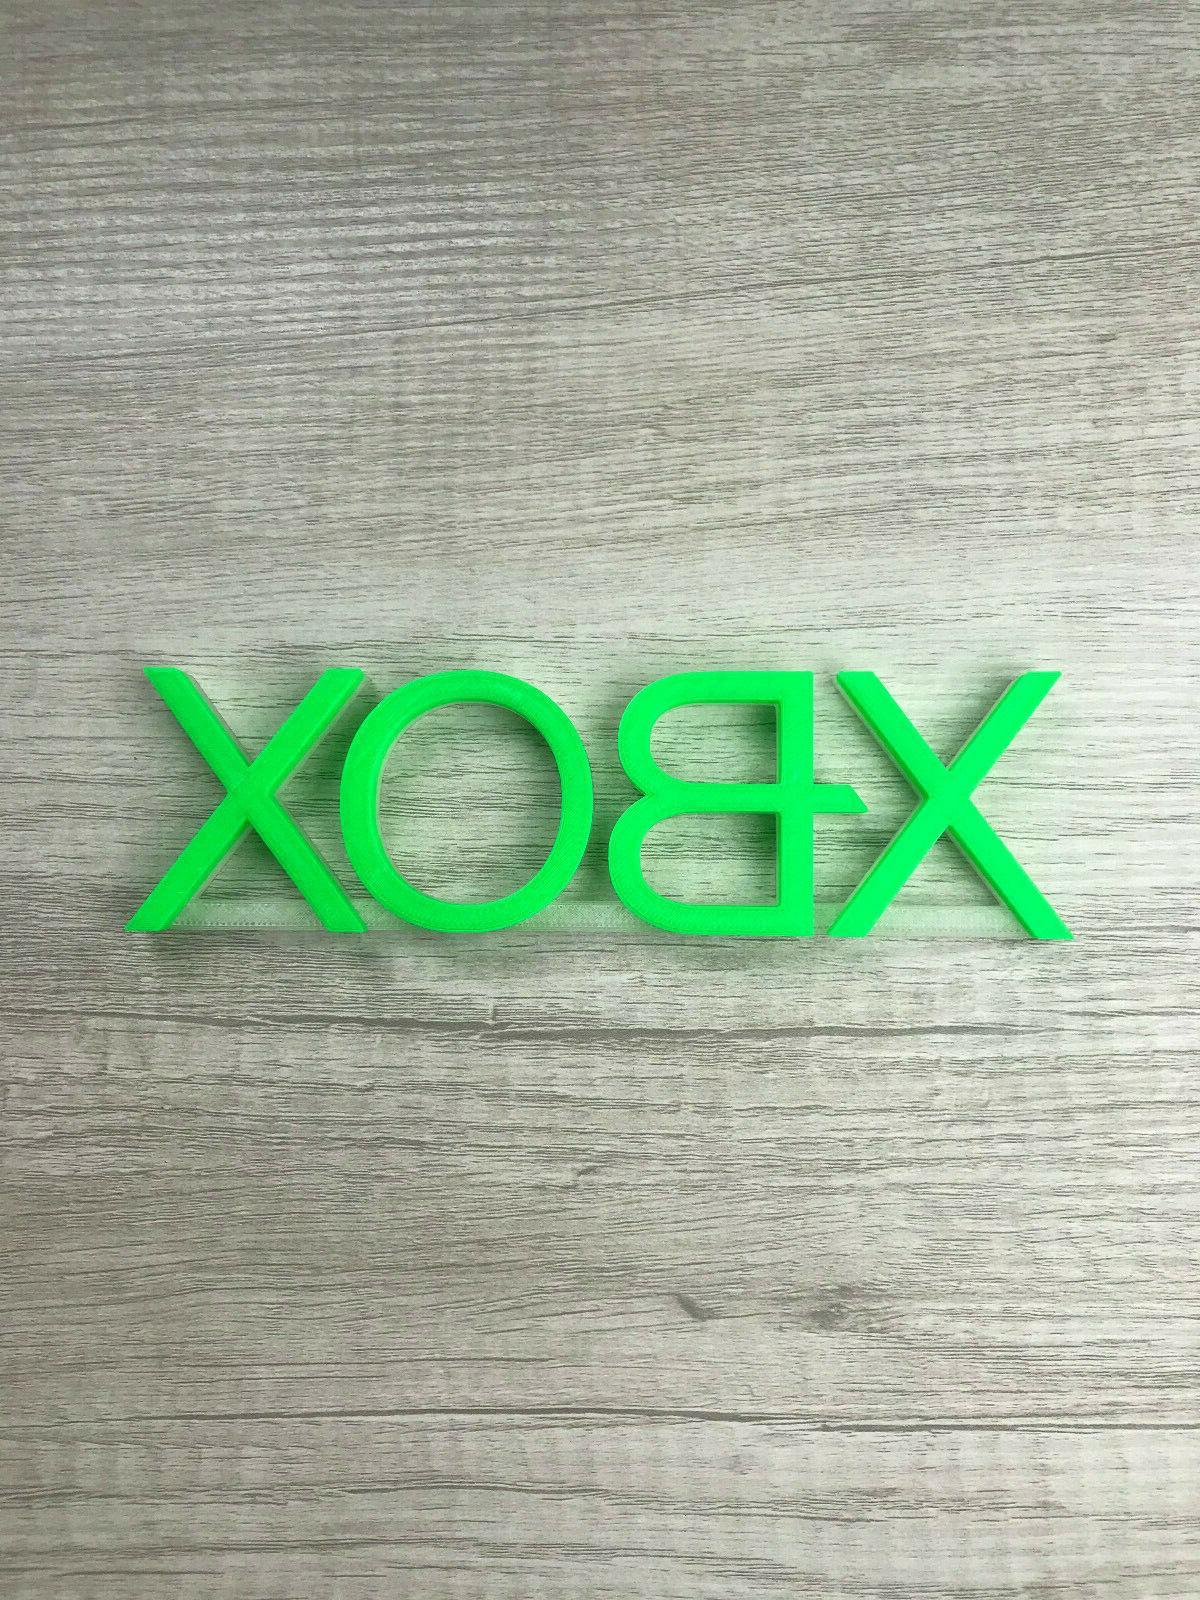 XBOX Video game logo man cave, room, shelf,